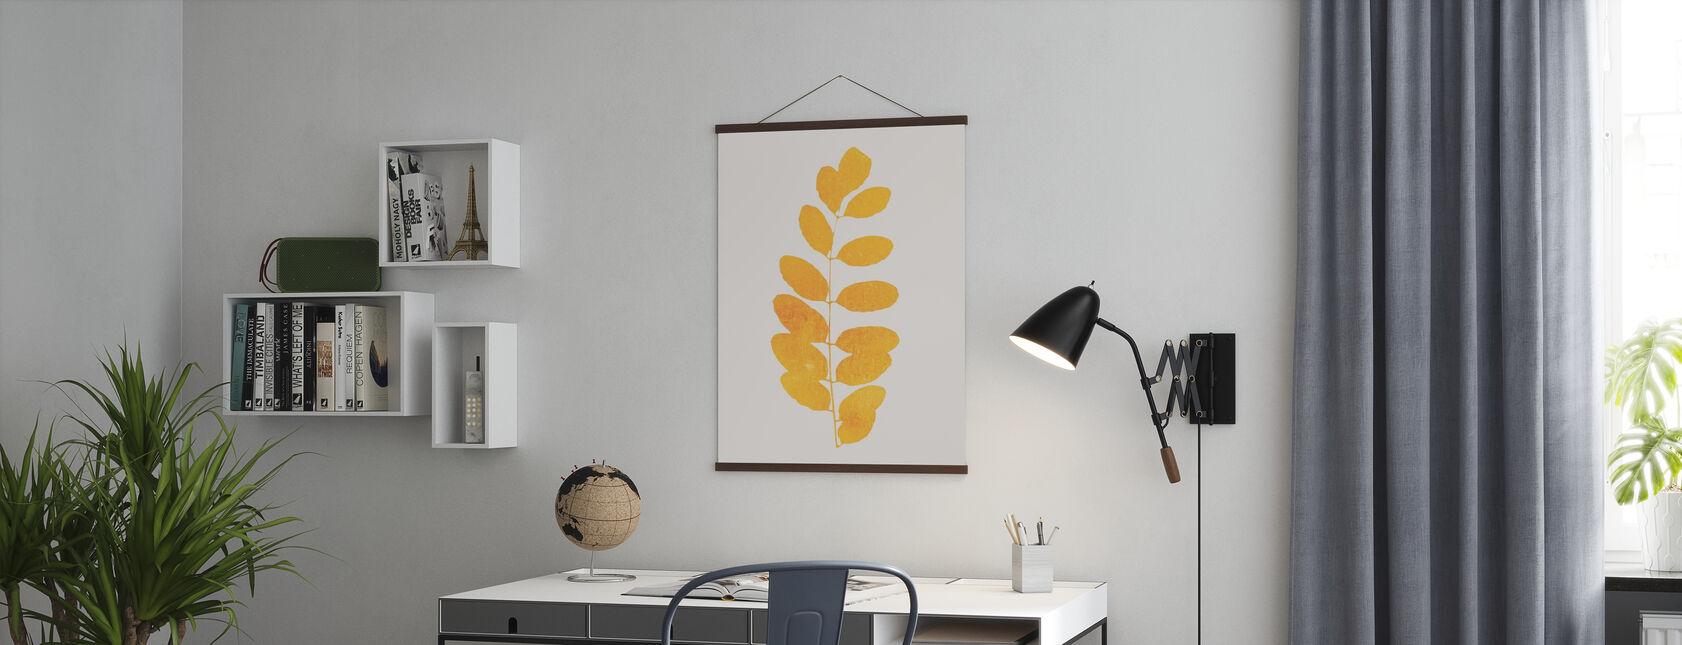 Blad - Amarillo - Plakat - Kontor